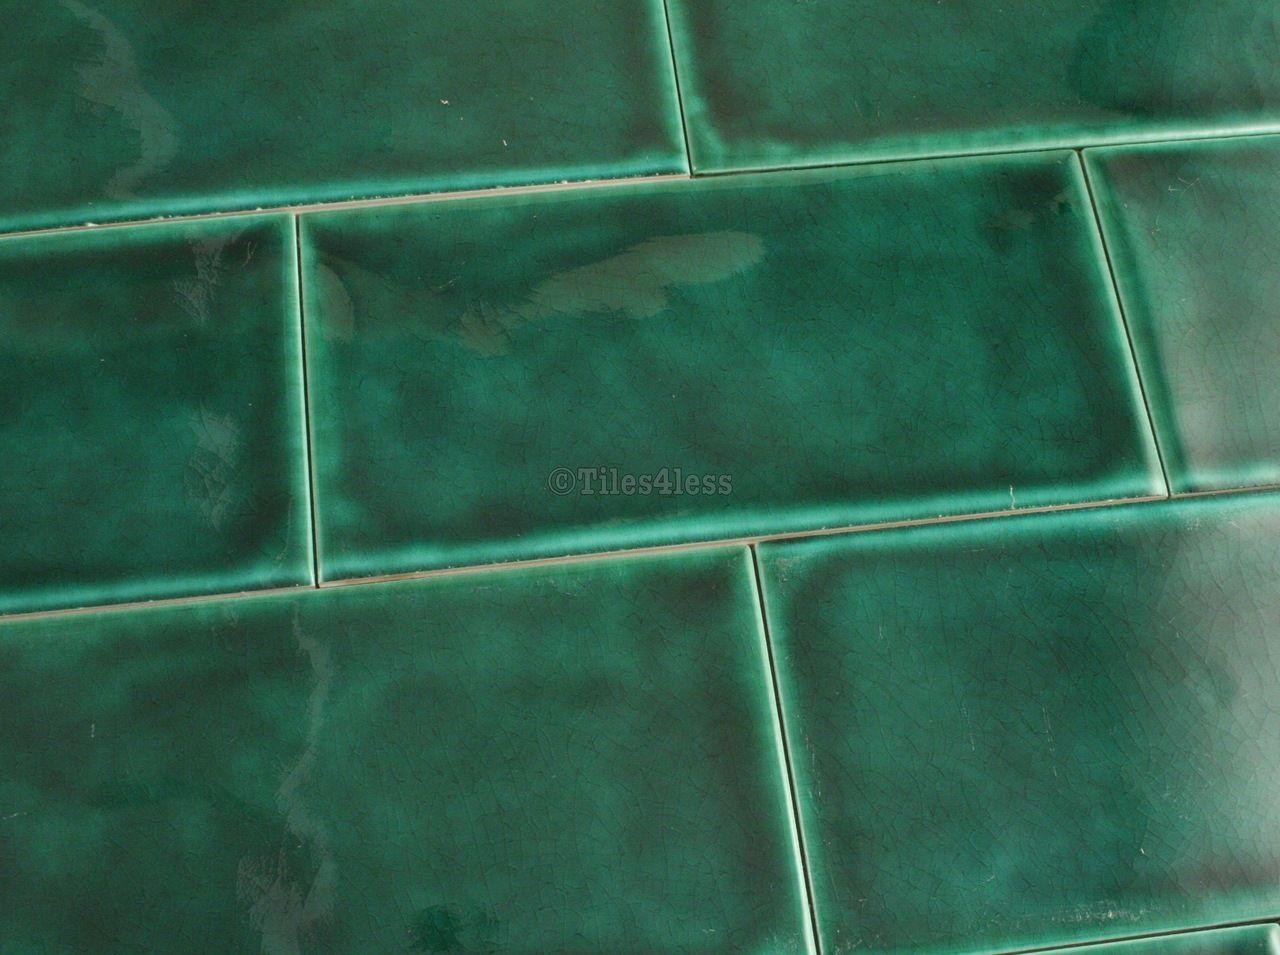 150x75mm dark green craquelle glaze subway tile sold per 097sqm buy 150x75mm dark green subway tile with craquelle glaze tiles4less dailygadgetfo Image collections